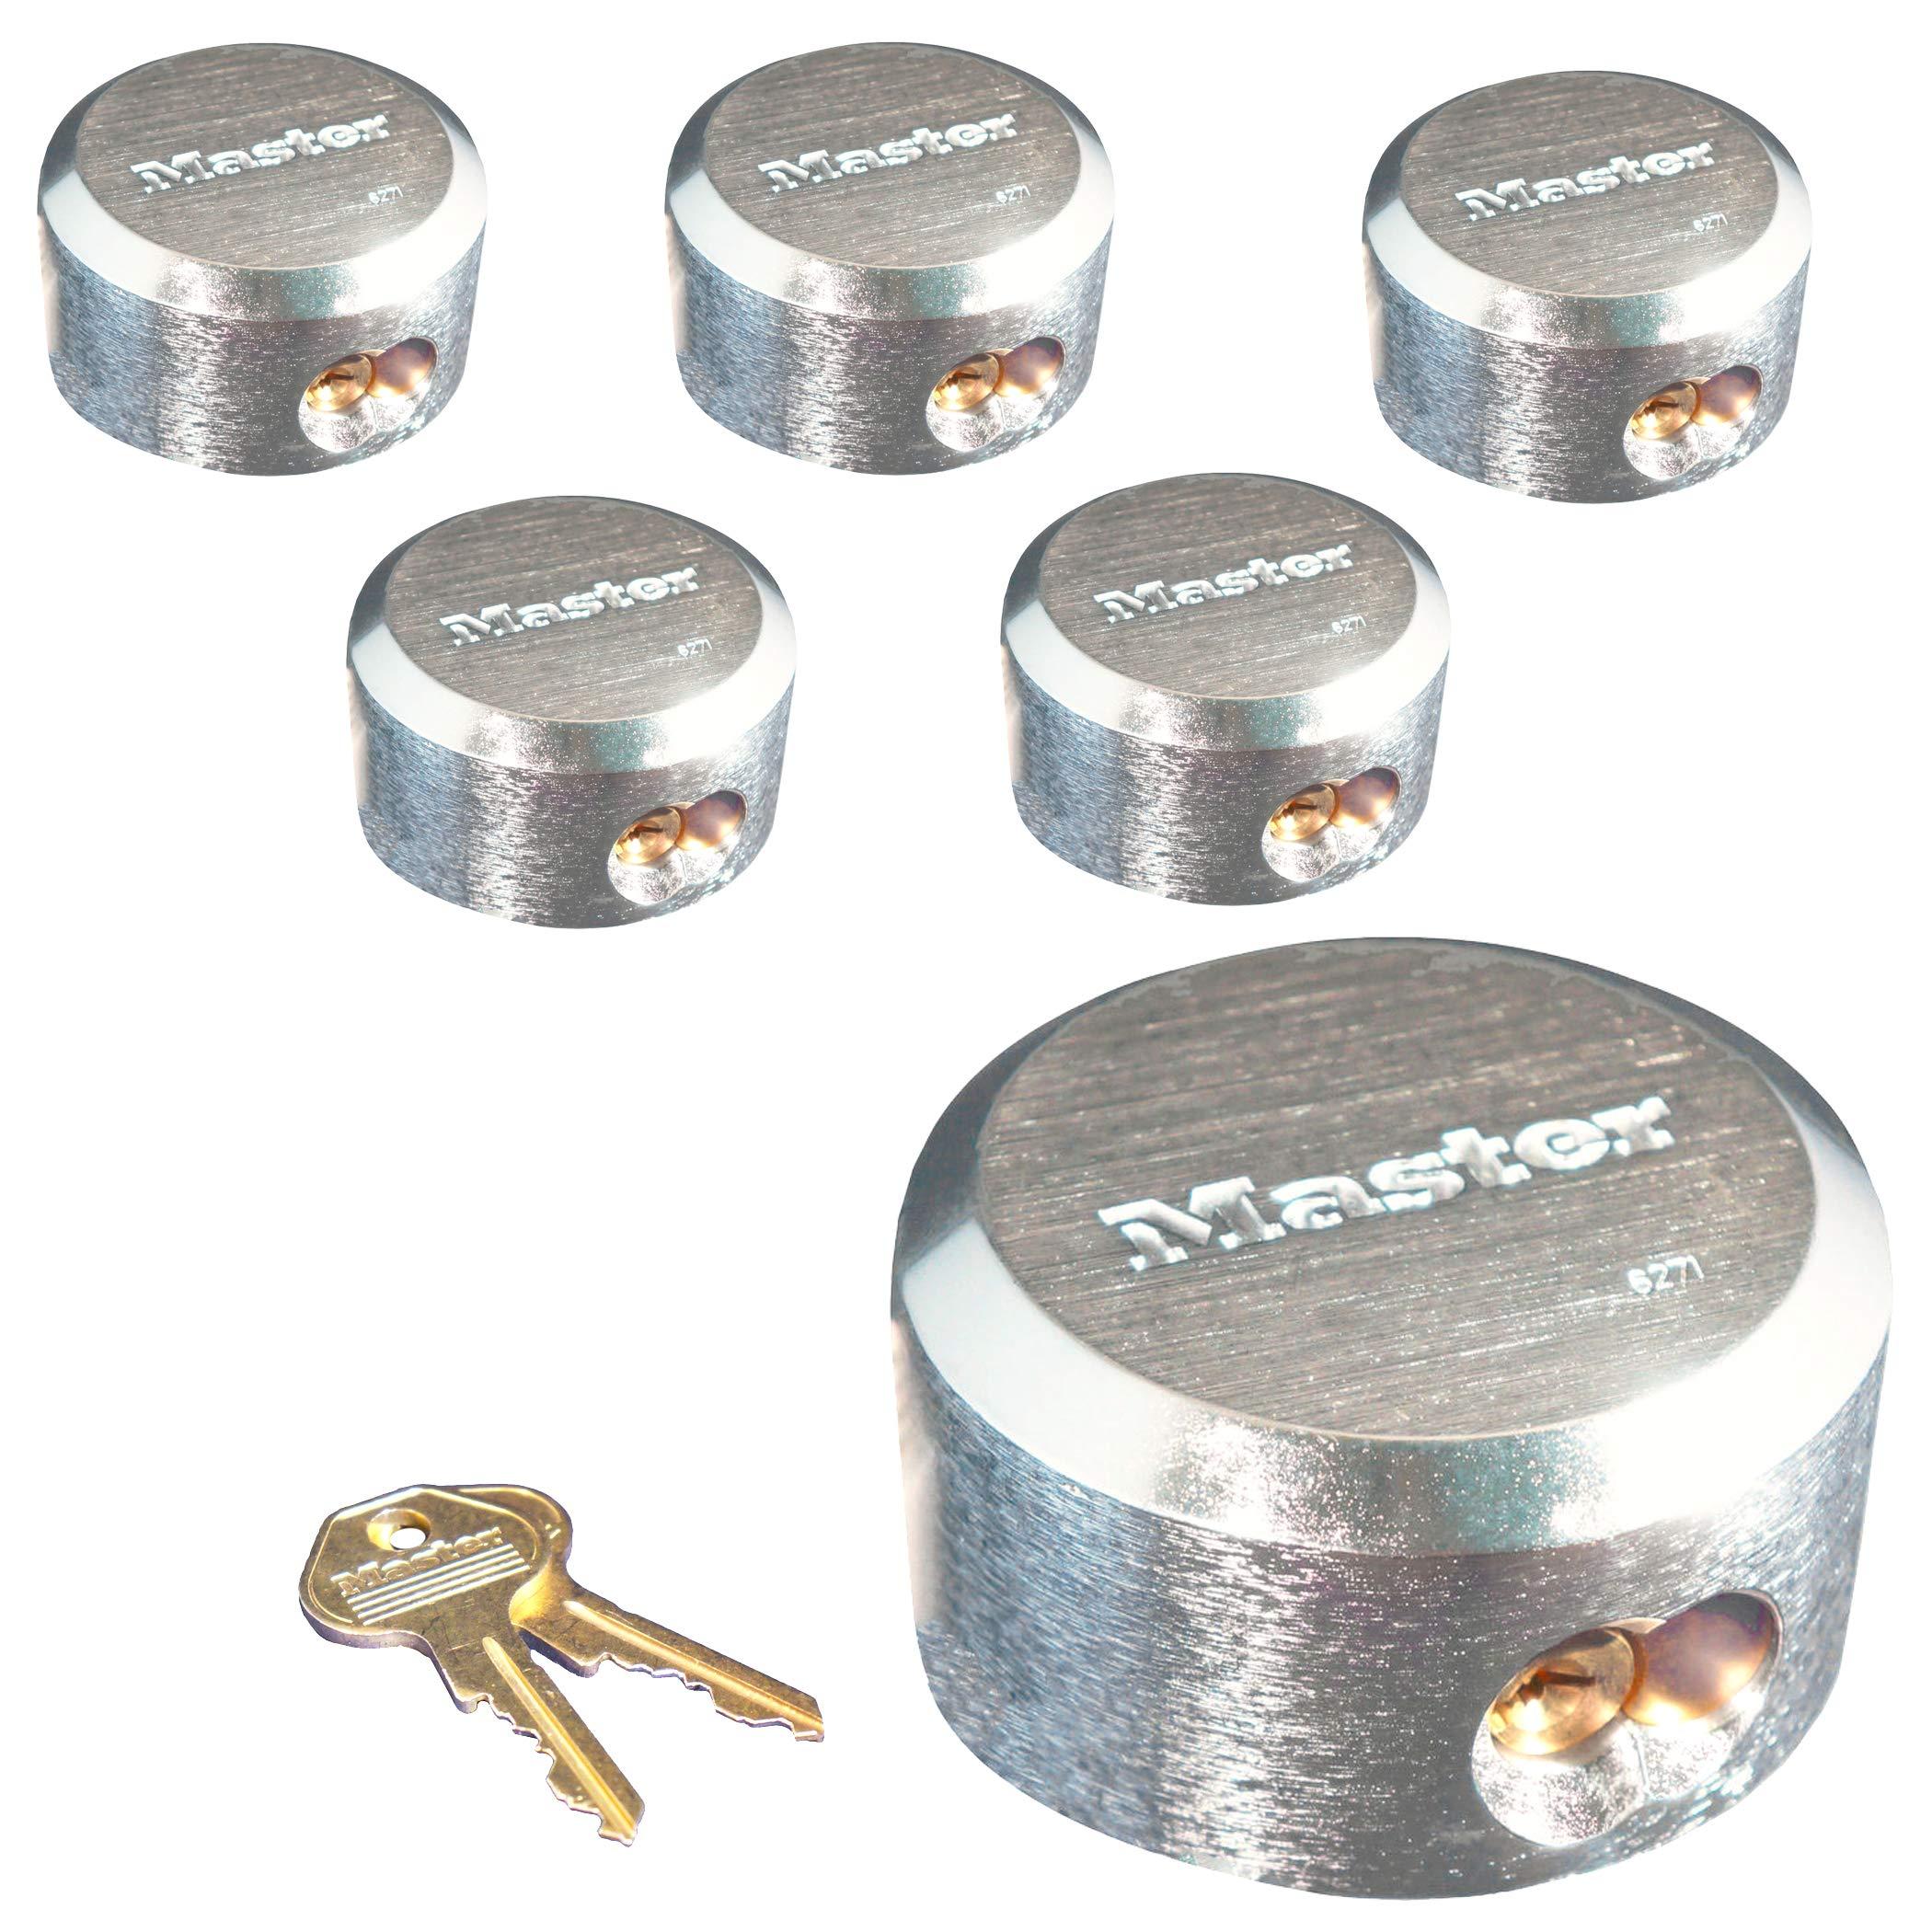 Master Lock Pro Series Hidden Shackle Padlocks, Keyed Alike 6271NKA-6 w/BumpStop Technology by Master Lock (Image #1)